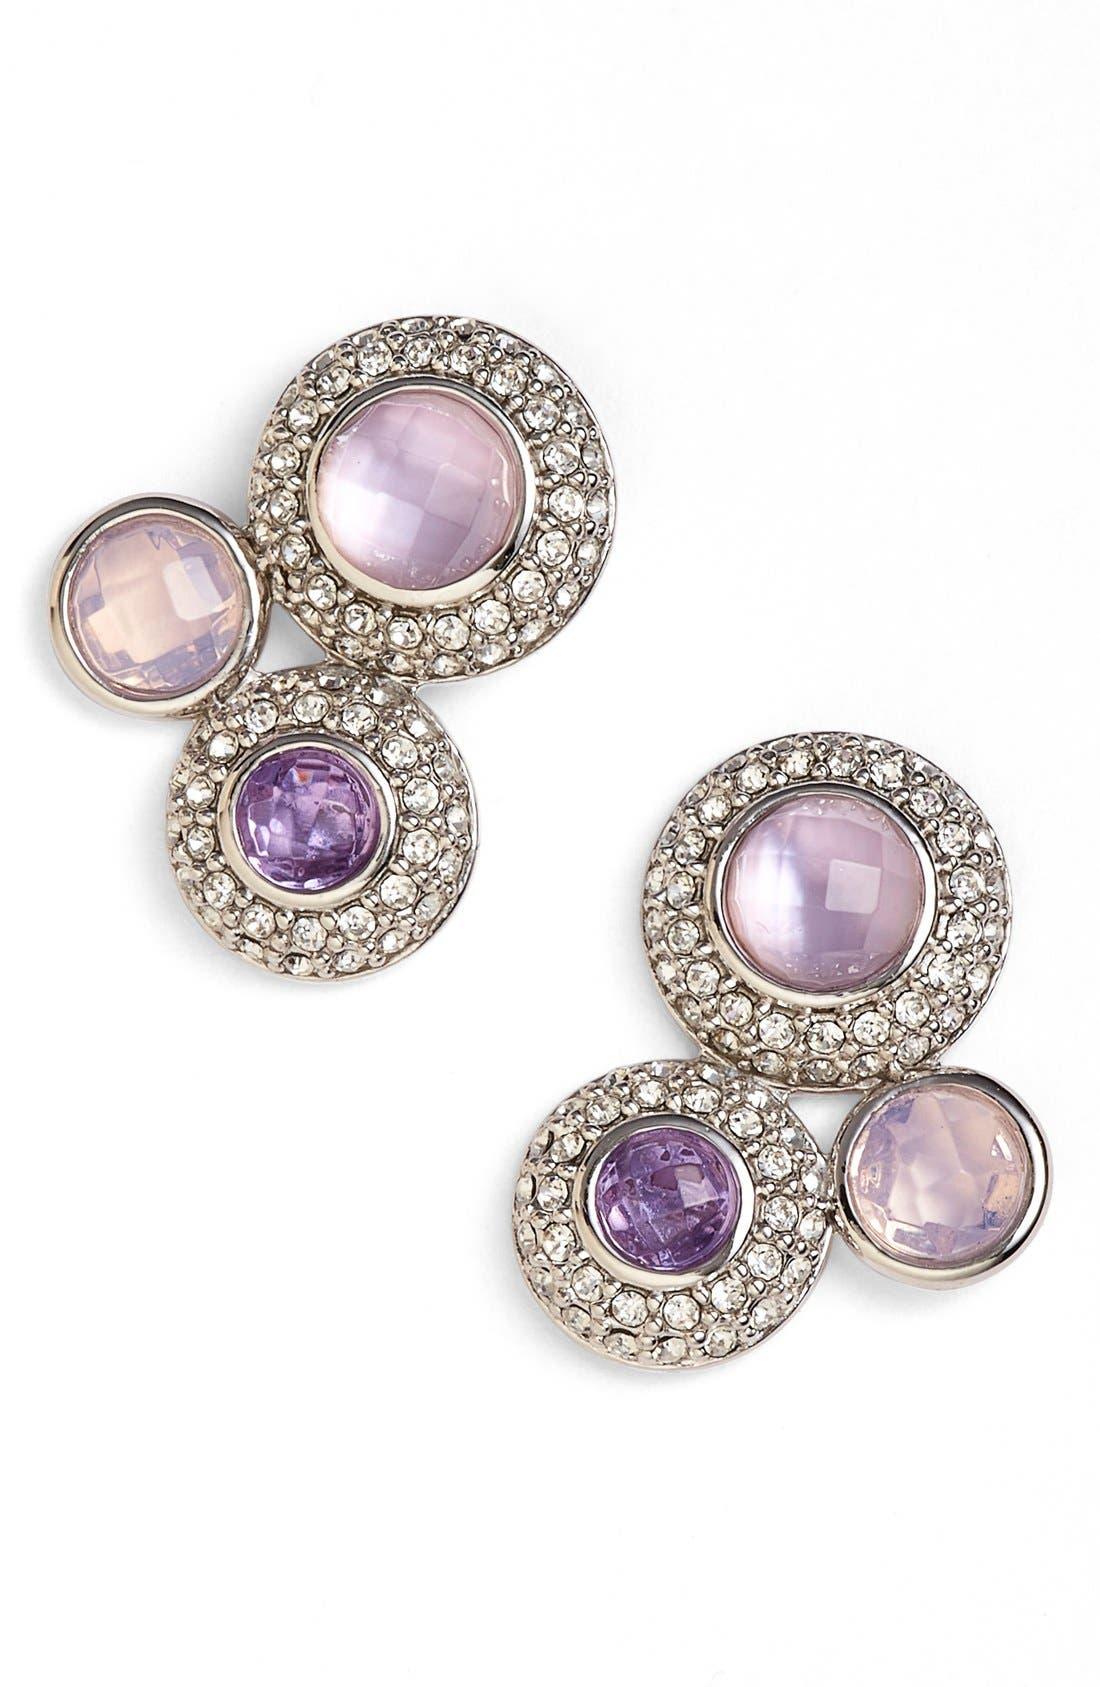 Alternate Image 1 Selected - Judith Jack Jeweled Cluster Stud Earrings